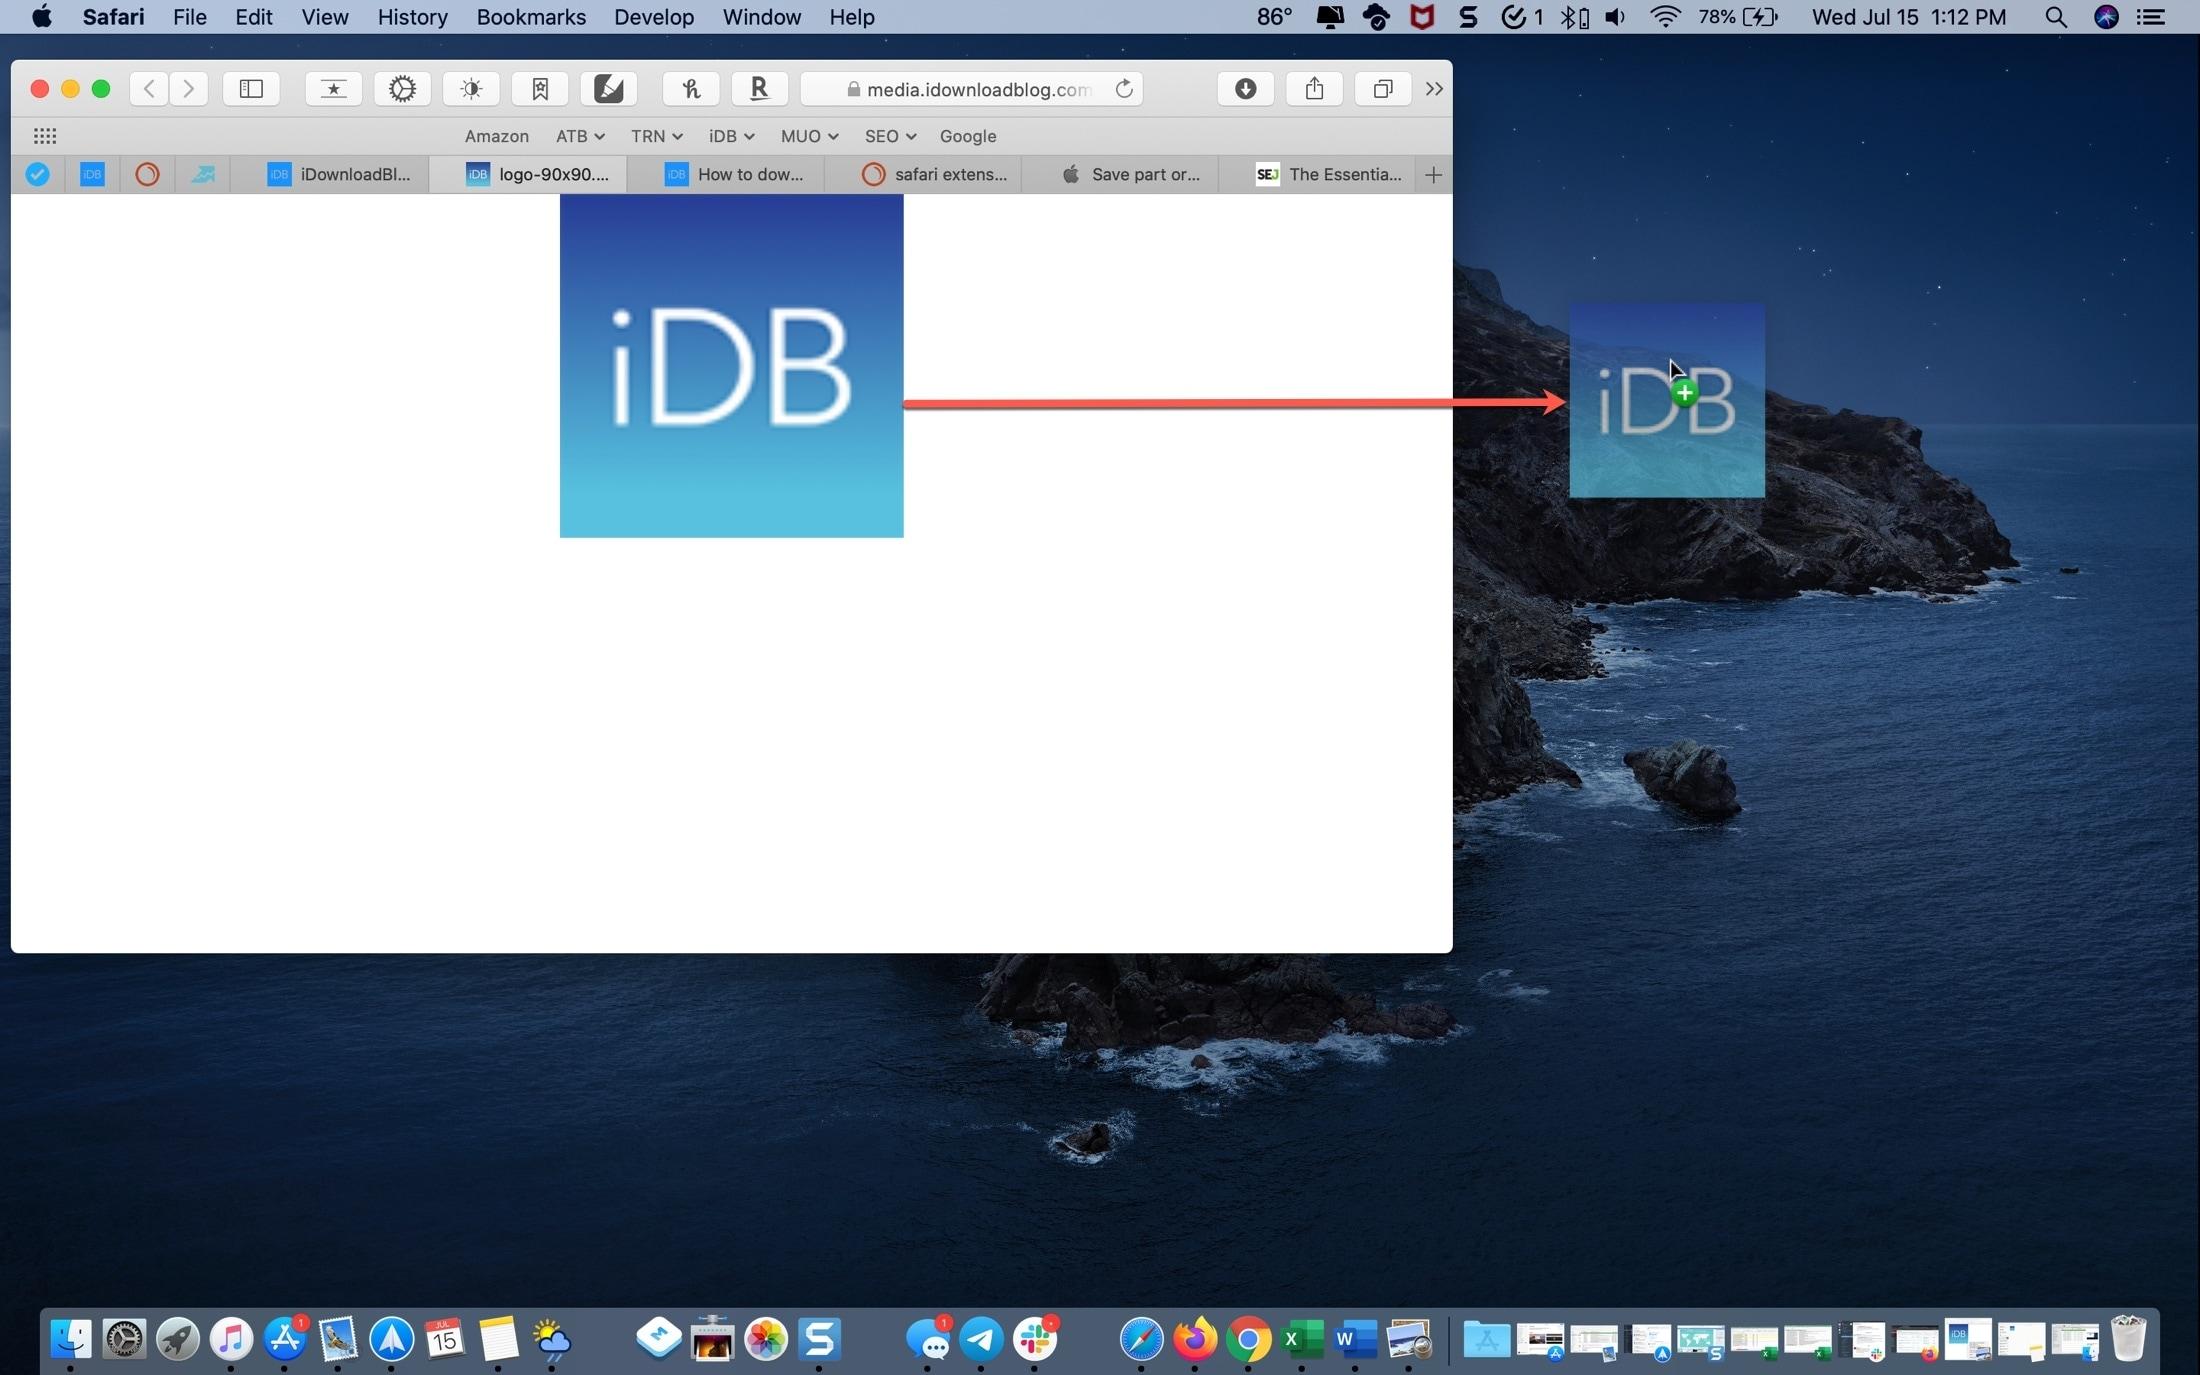 Safari Save Image to Desktop Mac